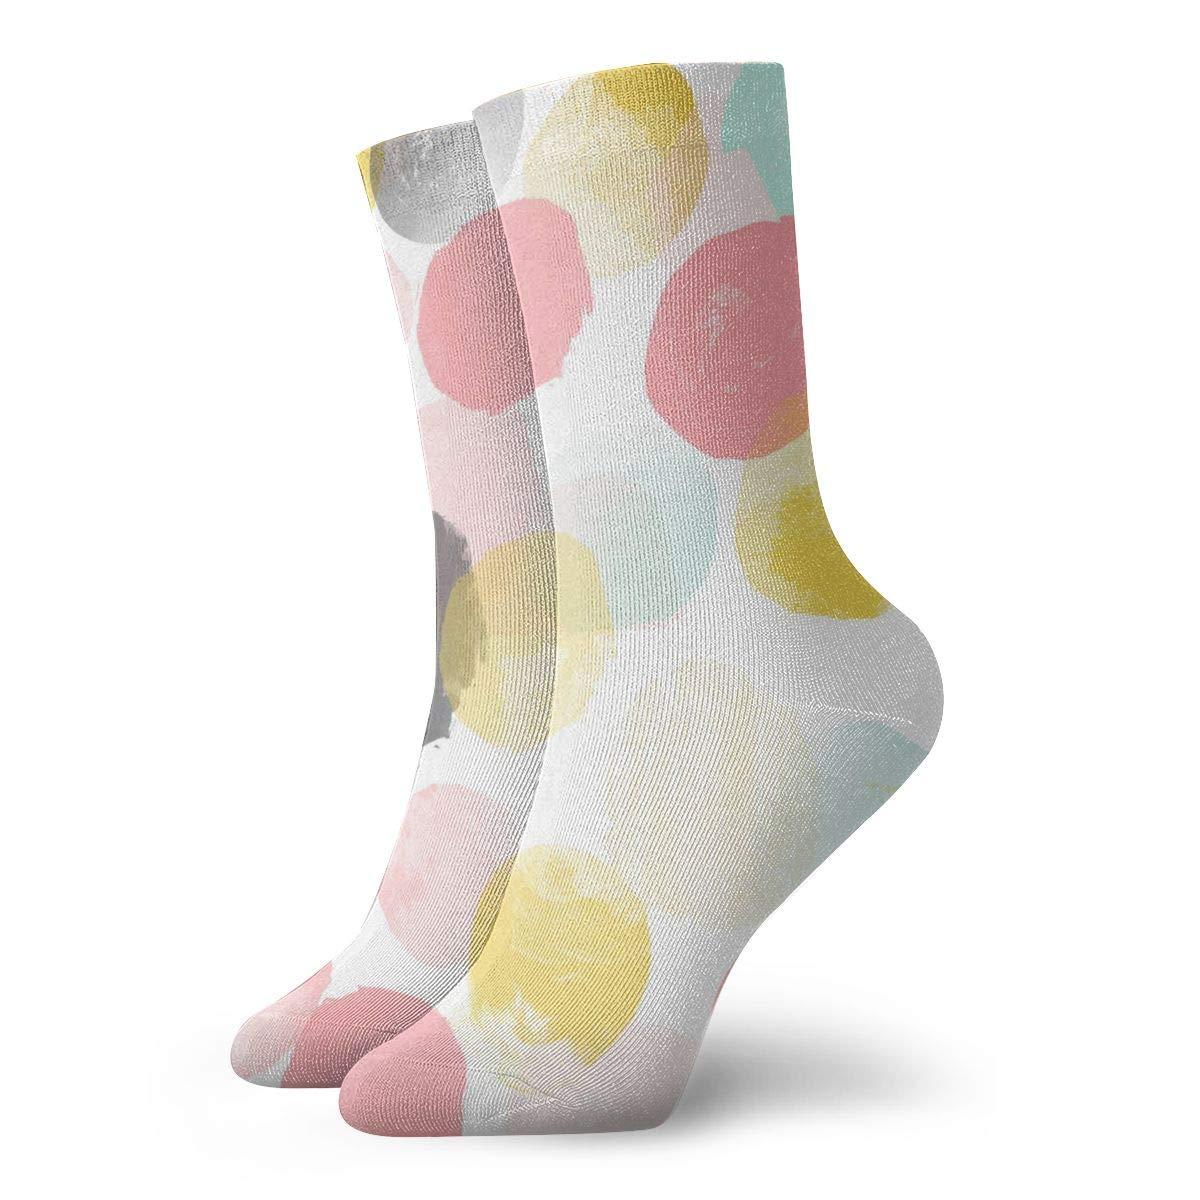 WEEDKEYCAT Colorful Circle Block Adult Short Socks Cotton Sports Socks for Mens Womens Yoga Hiking Cycling Running Soccer Sports